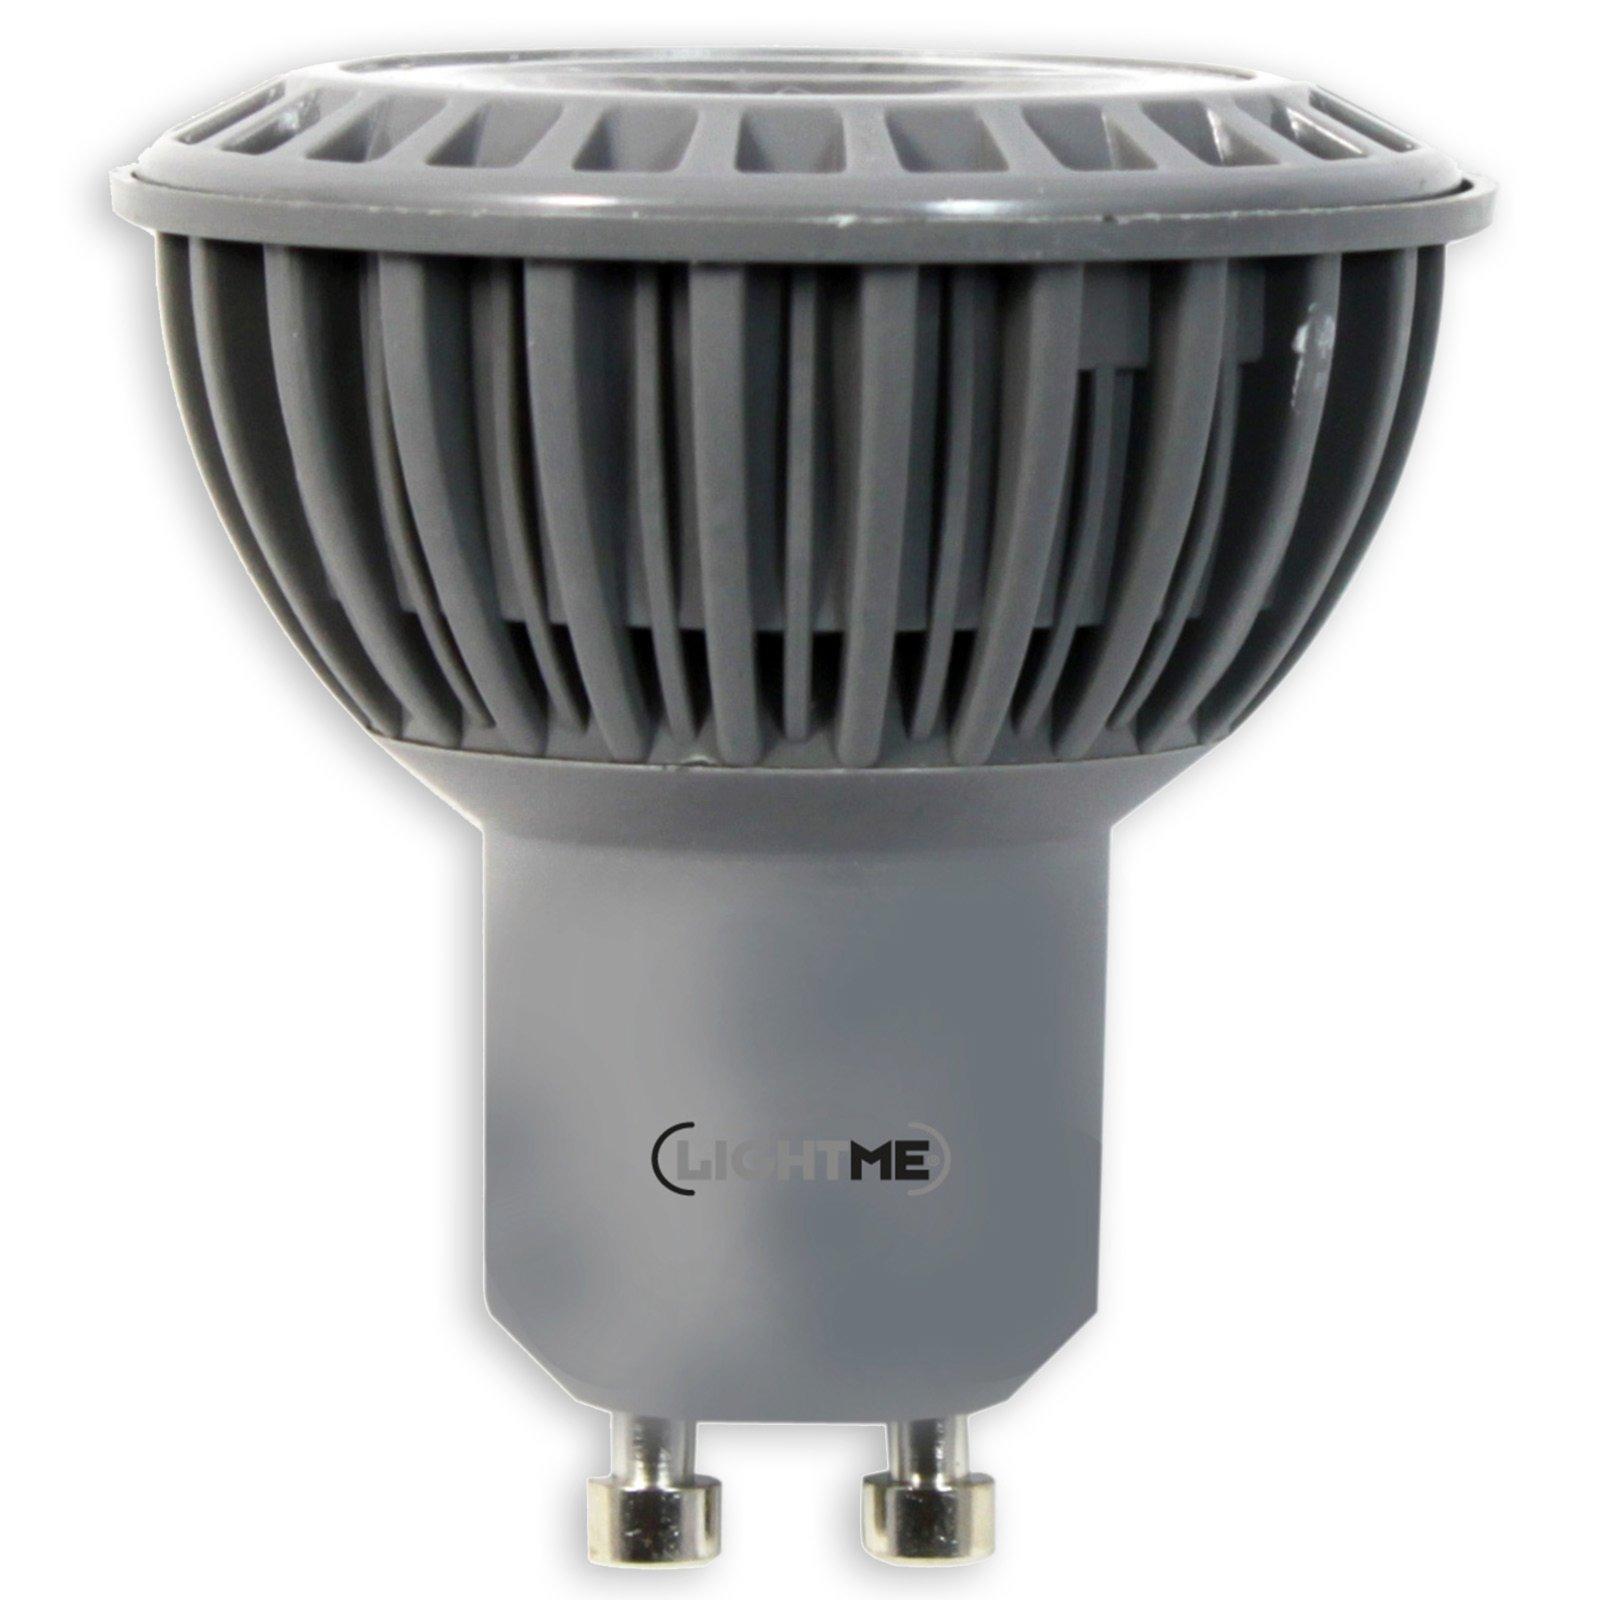 led reflektor lightme gu10 4 watt warmwei led. Black Bedroom Furniture Sets. Home Design Ideas